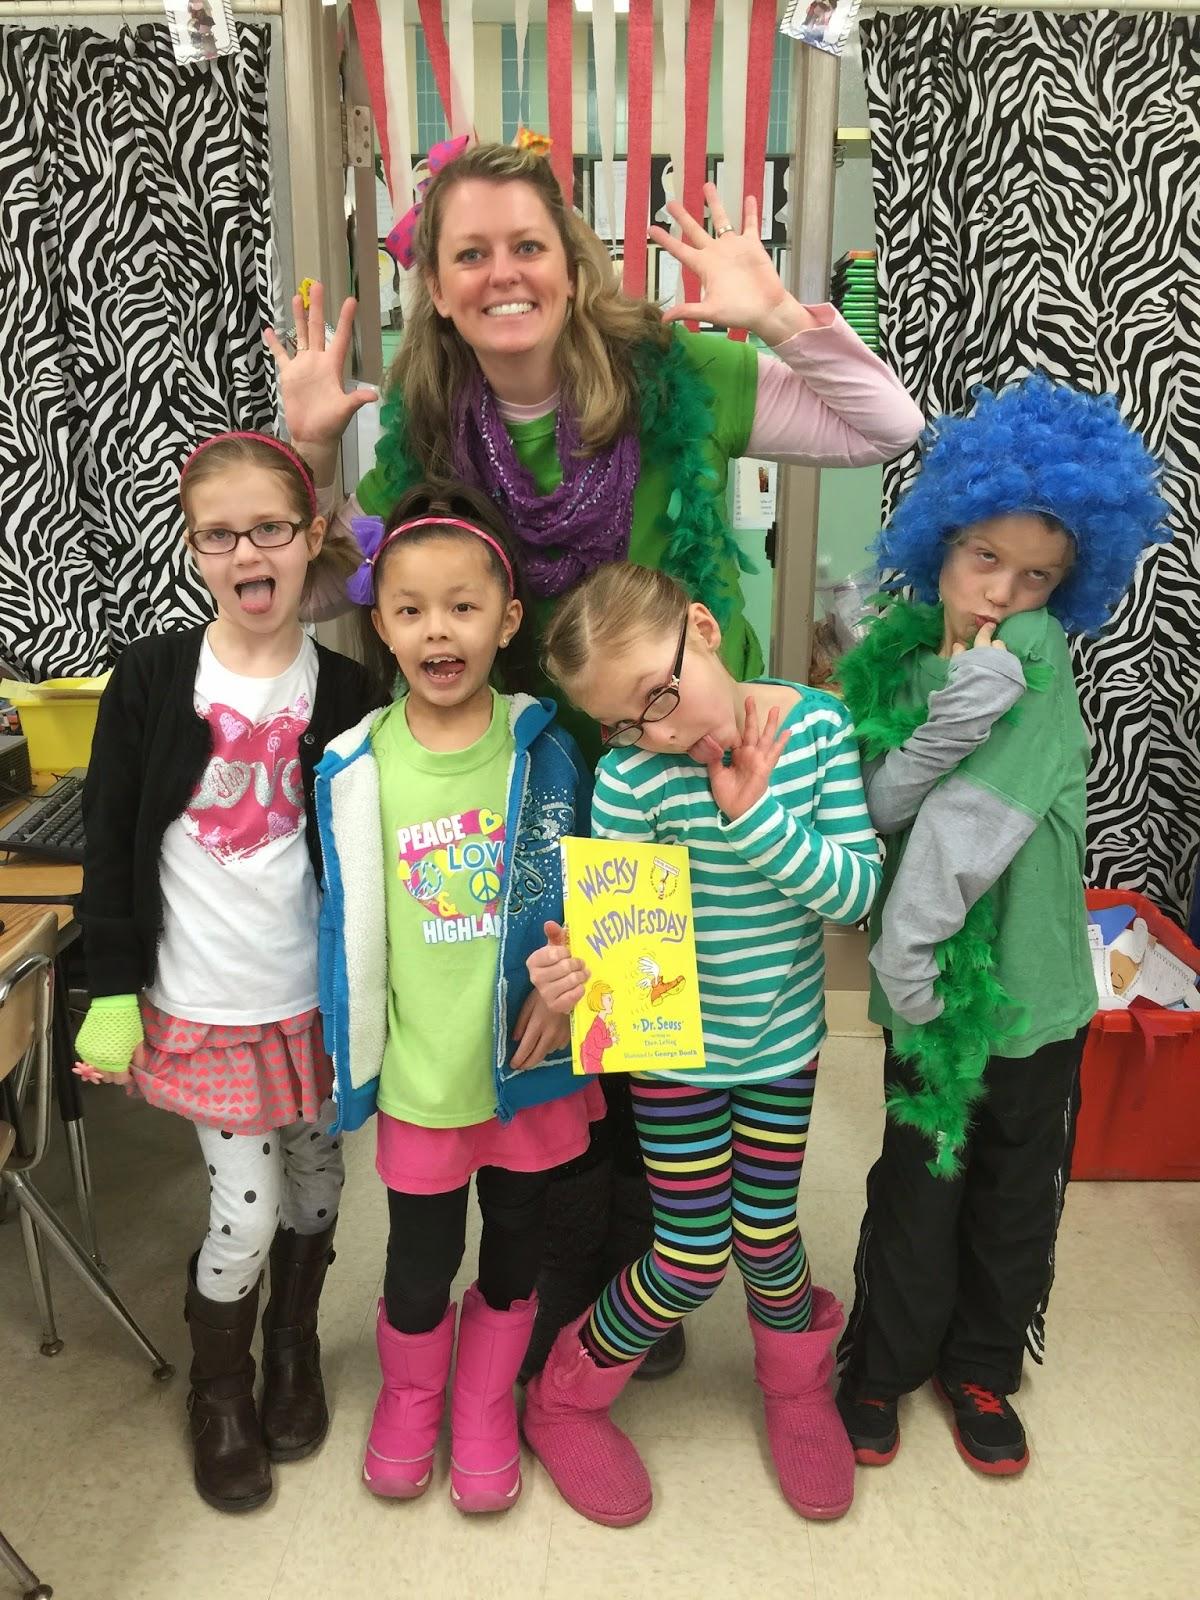 Day 3 Dr. Seuss 5 Day Freebie...Wacky Wednesday - First Grade Roars!